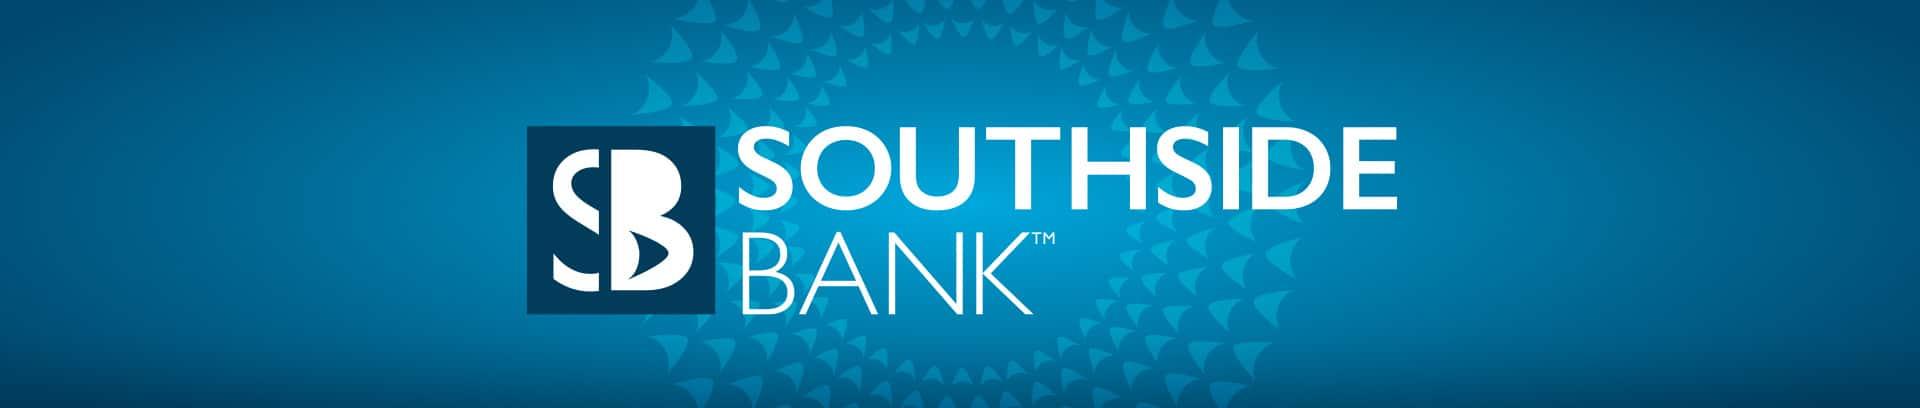 Southside Bank Branded Campaign